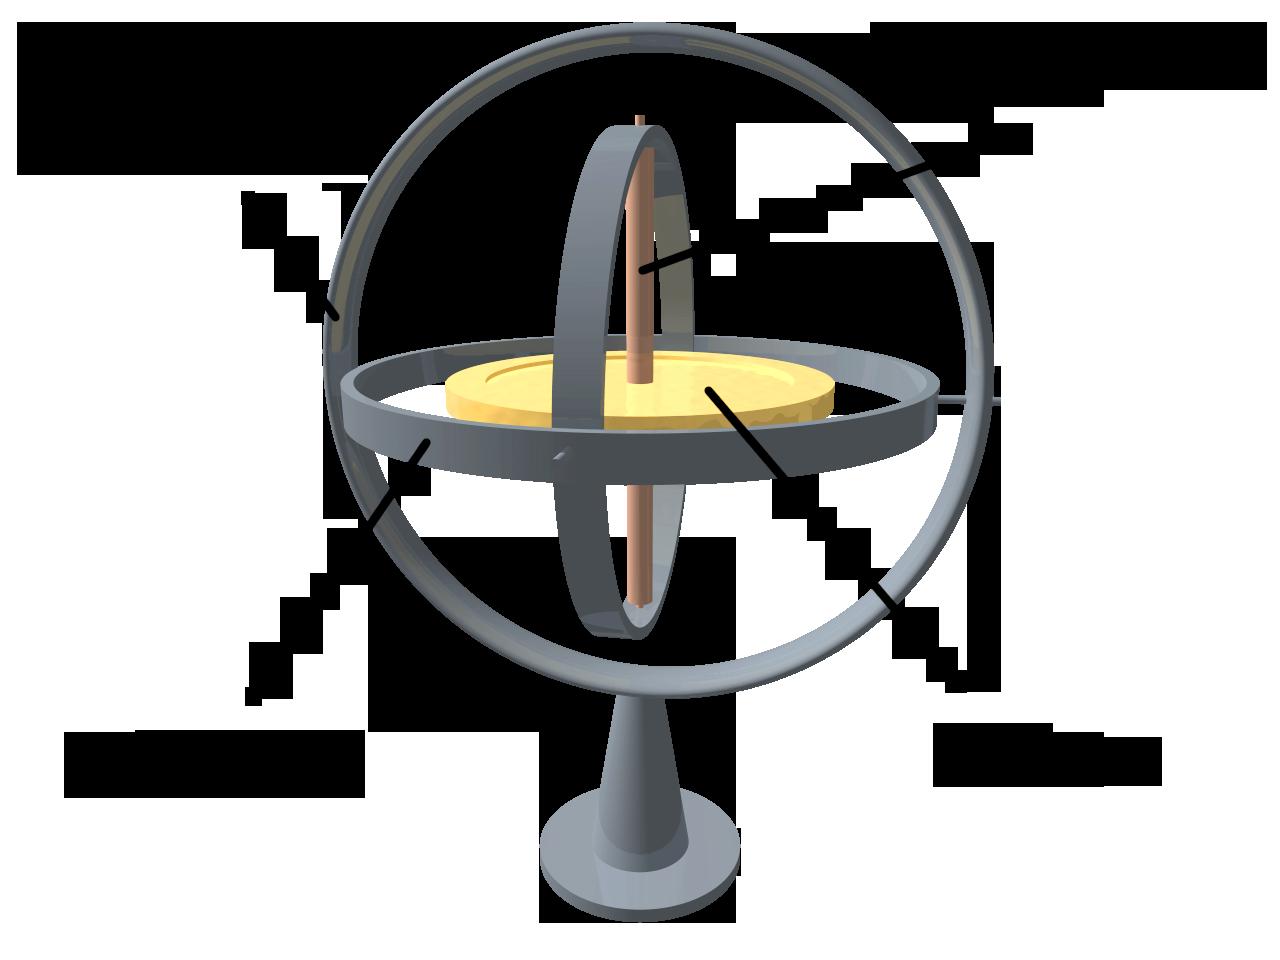 3d gyroscope